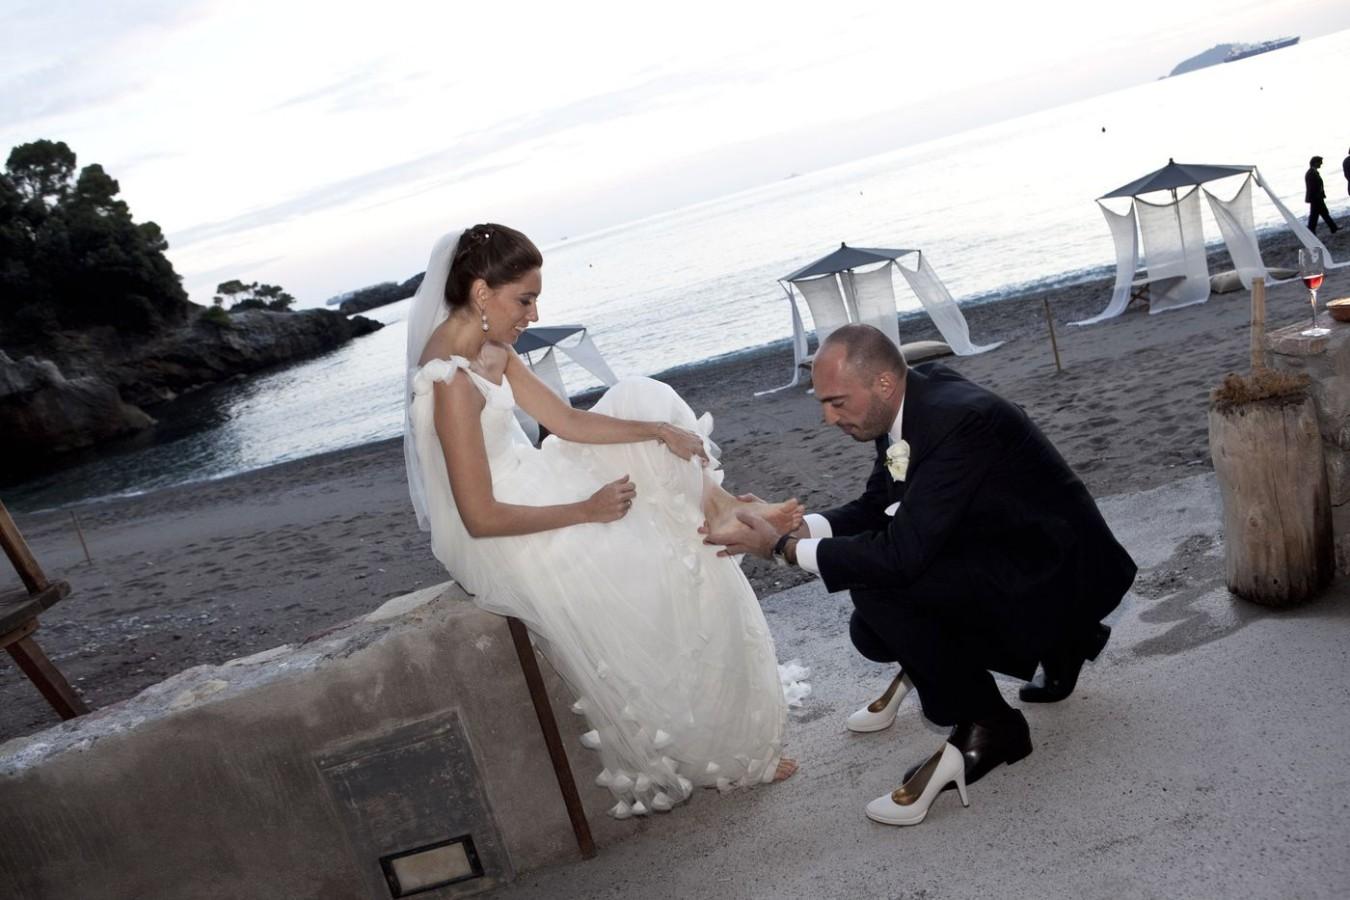 Wedding_Italian_Riviera_18-1350×900